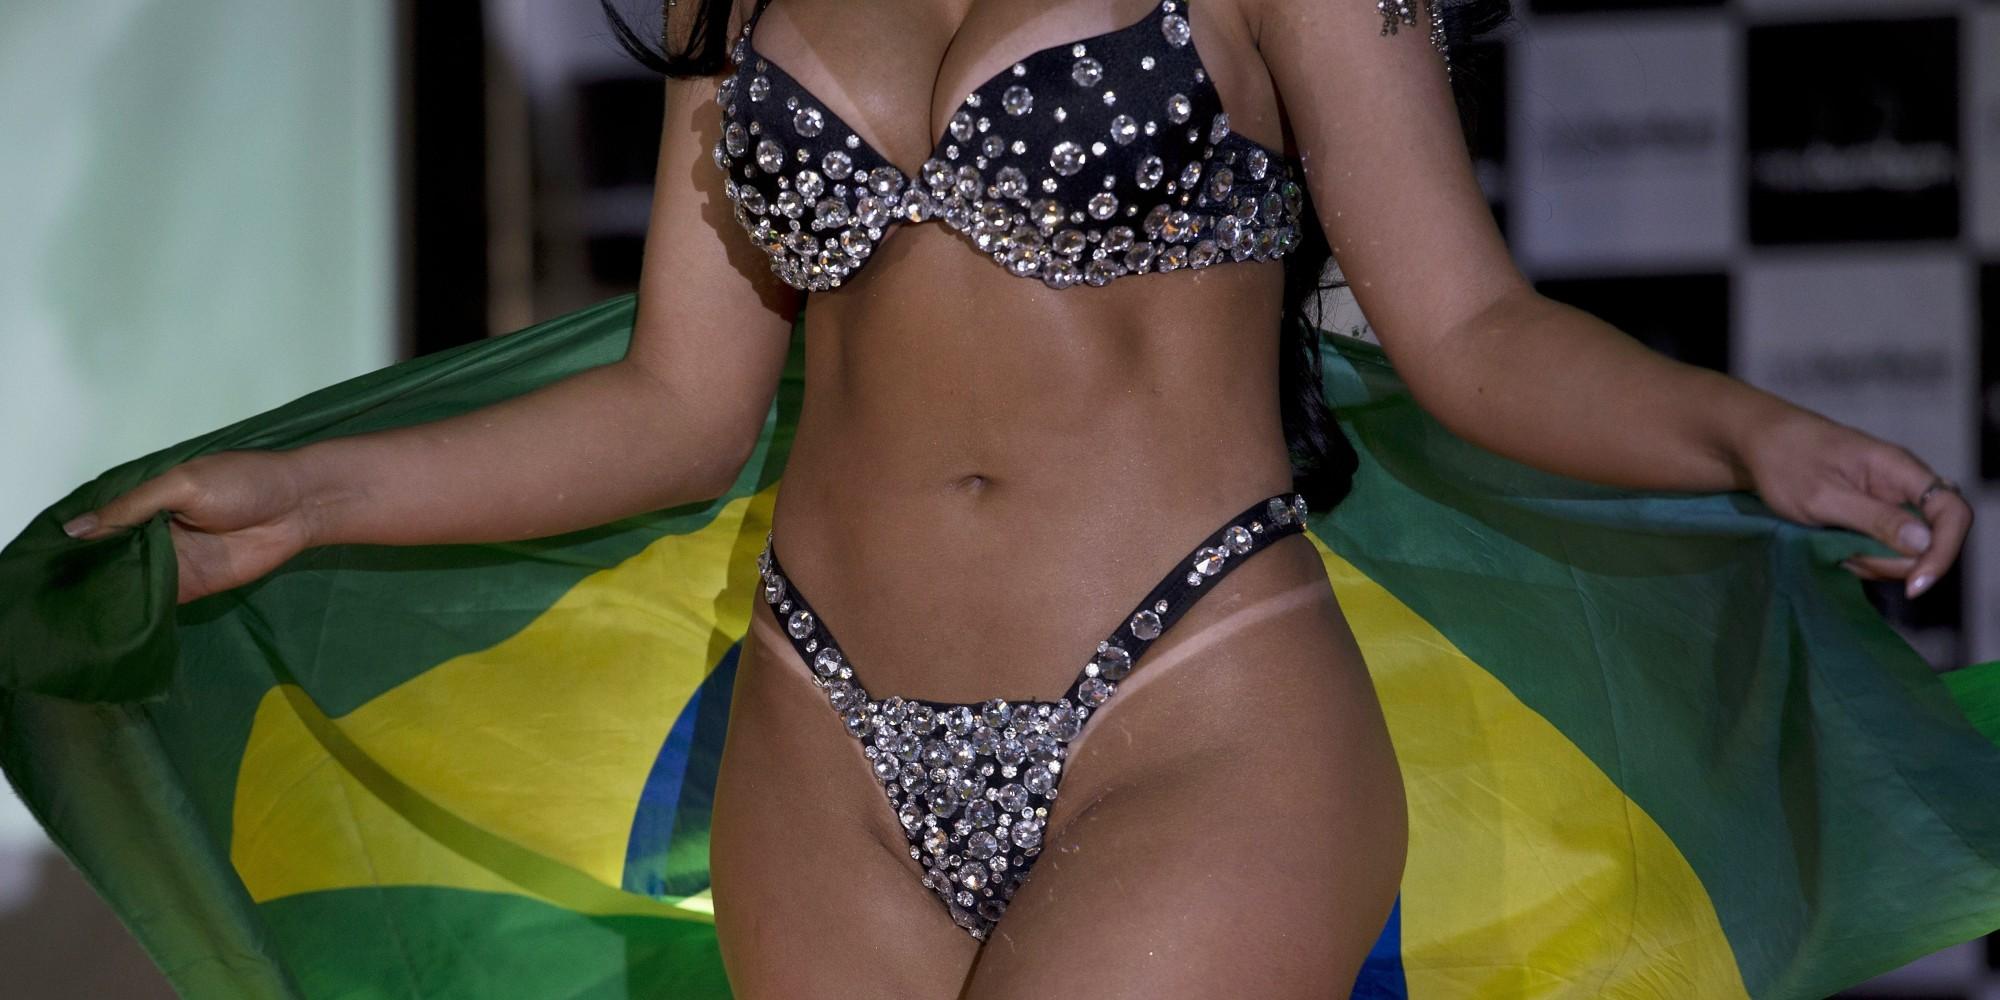 Youtube Indianara Carvalho nudes (43 photos), Tits, Is a cute, Instagram, underwear 2018